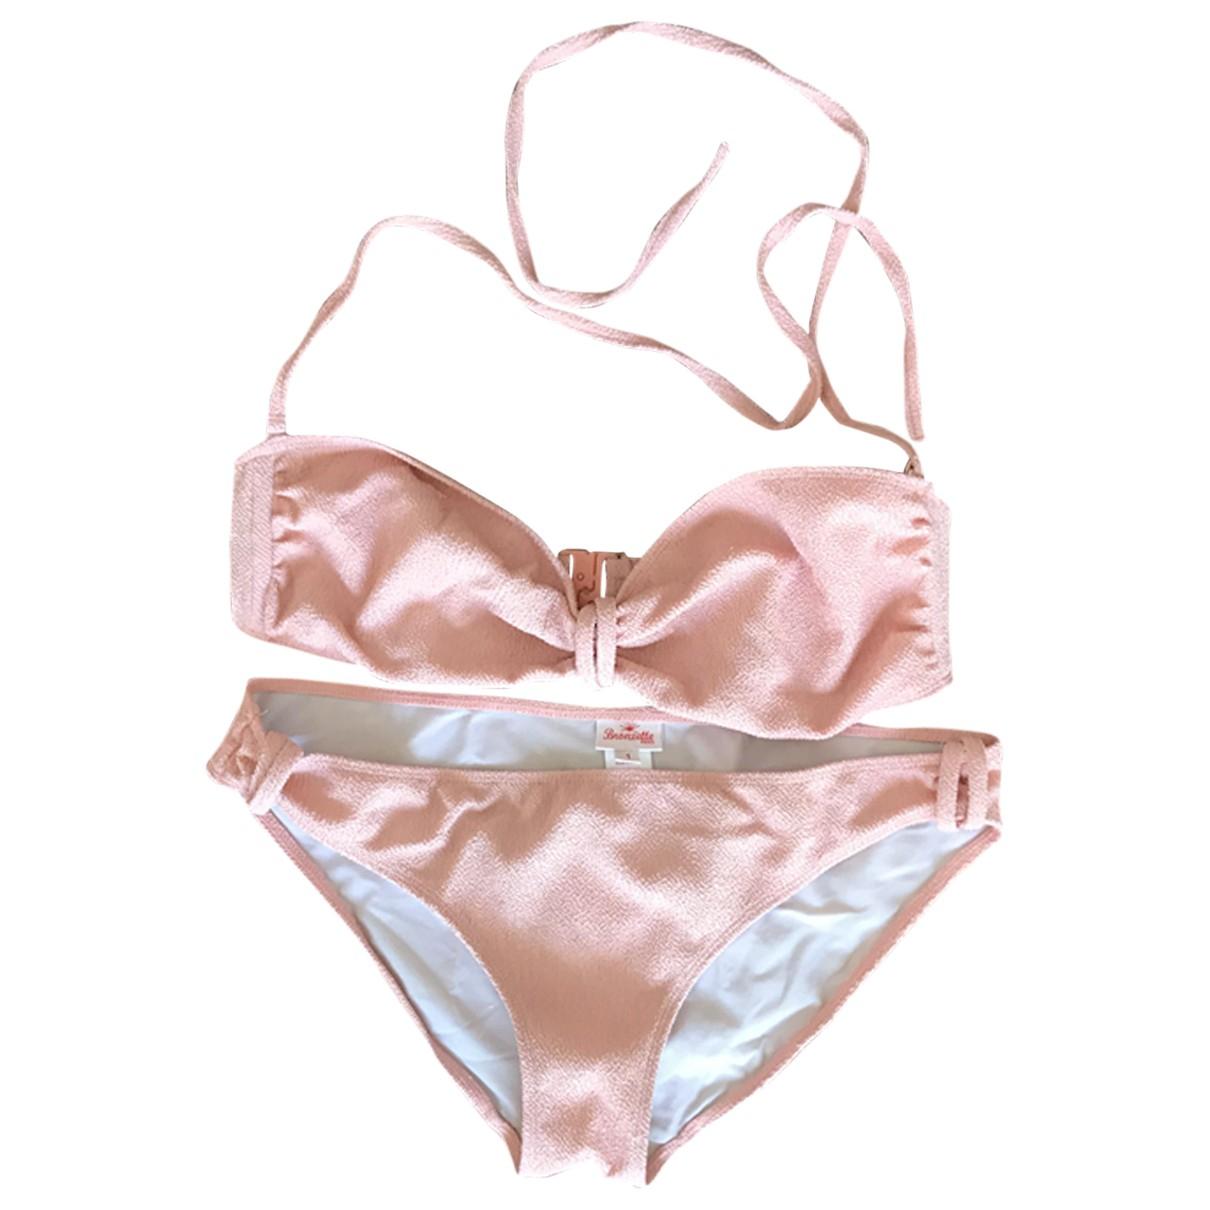 Bronzette \N Badeanzug in  Rosa Baumwolle - Elasthan